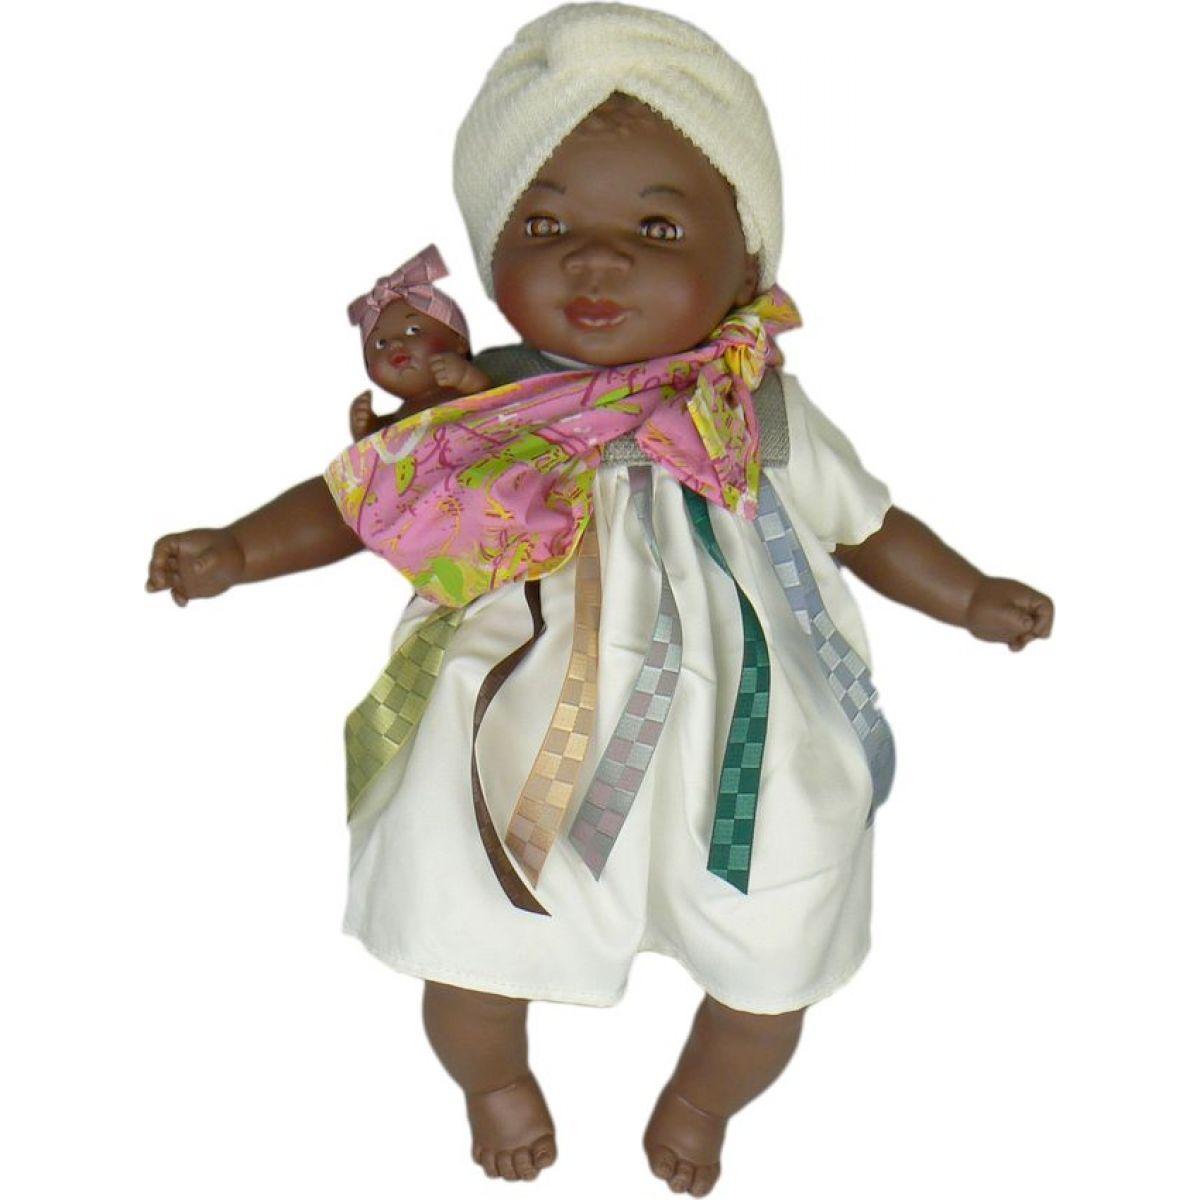 Nines Maha Con Bebe 45 cm - Bílé šaty